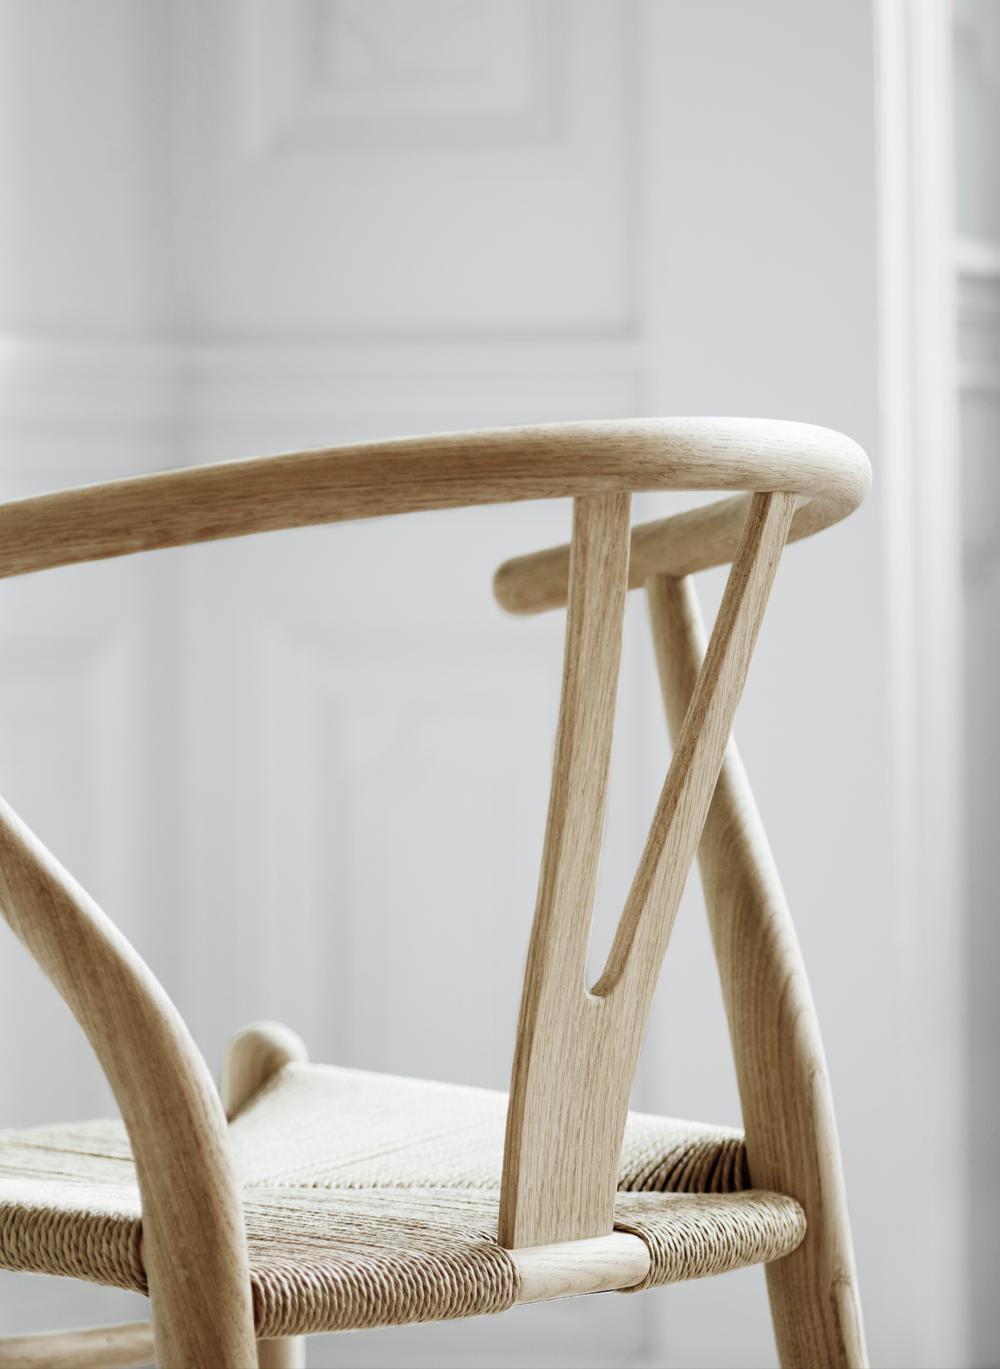 Betaalbare Design Stoelen.Design Stoelen Loncin Interieur A Beautiful Home